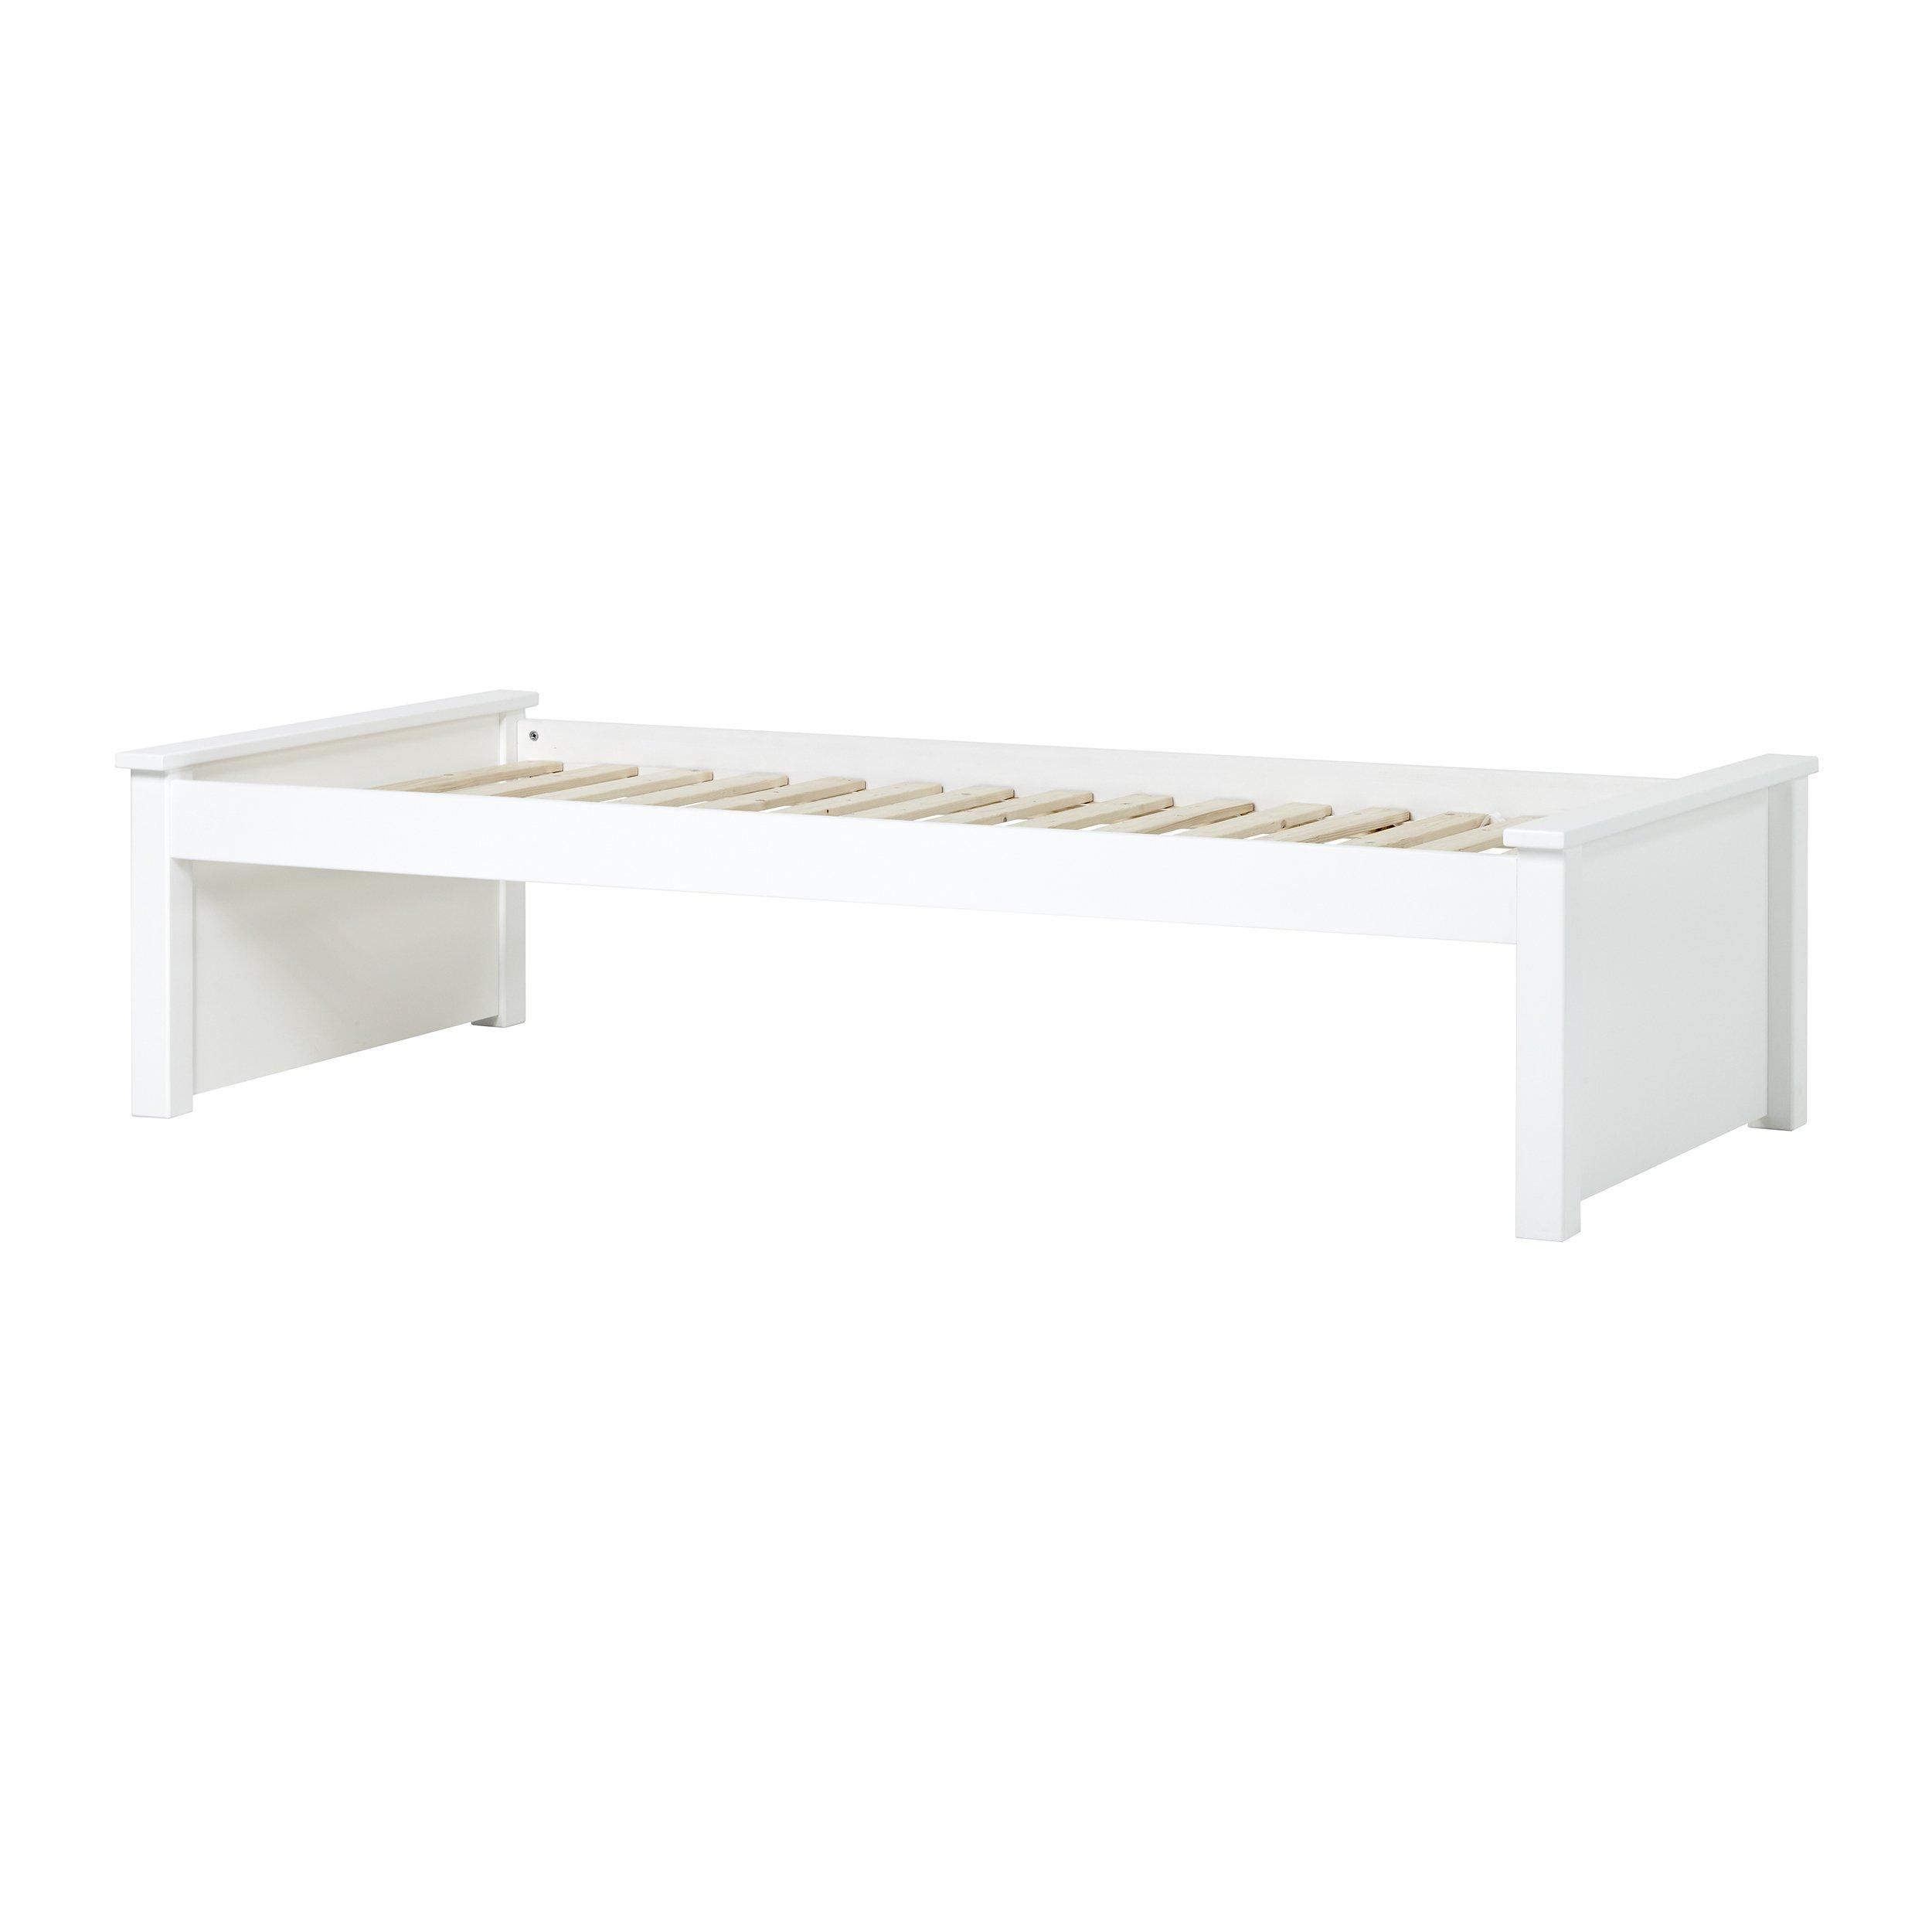 Hoppekids - MAJA DELUXE Junior bed w. 2 Low Bed ends 90x200cm - White